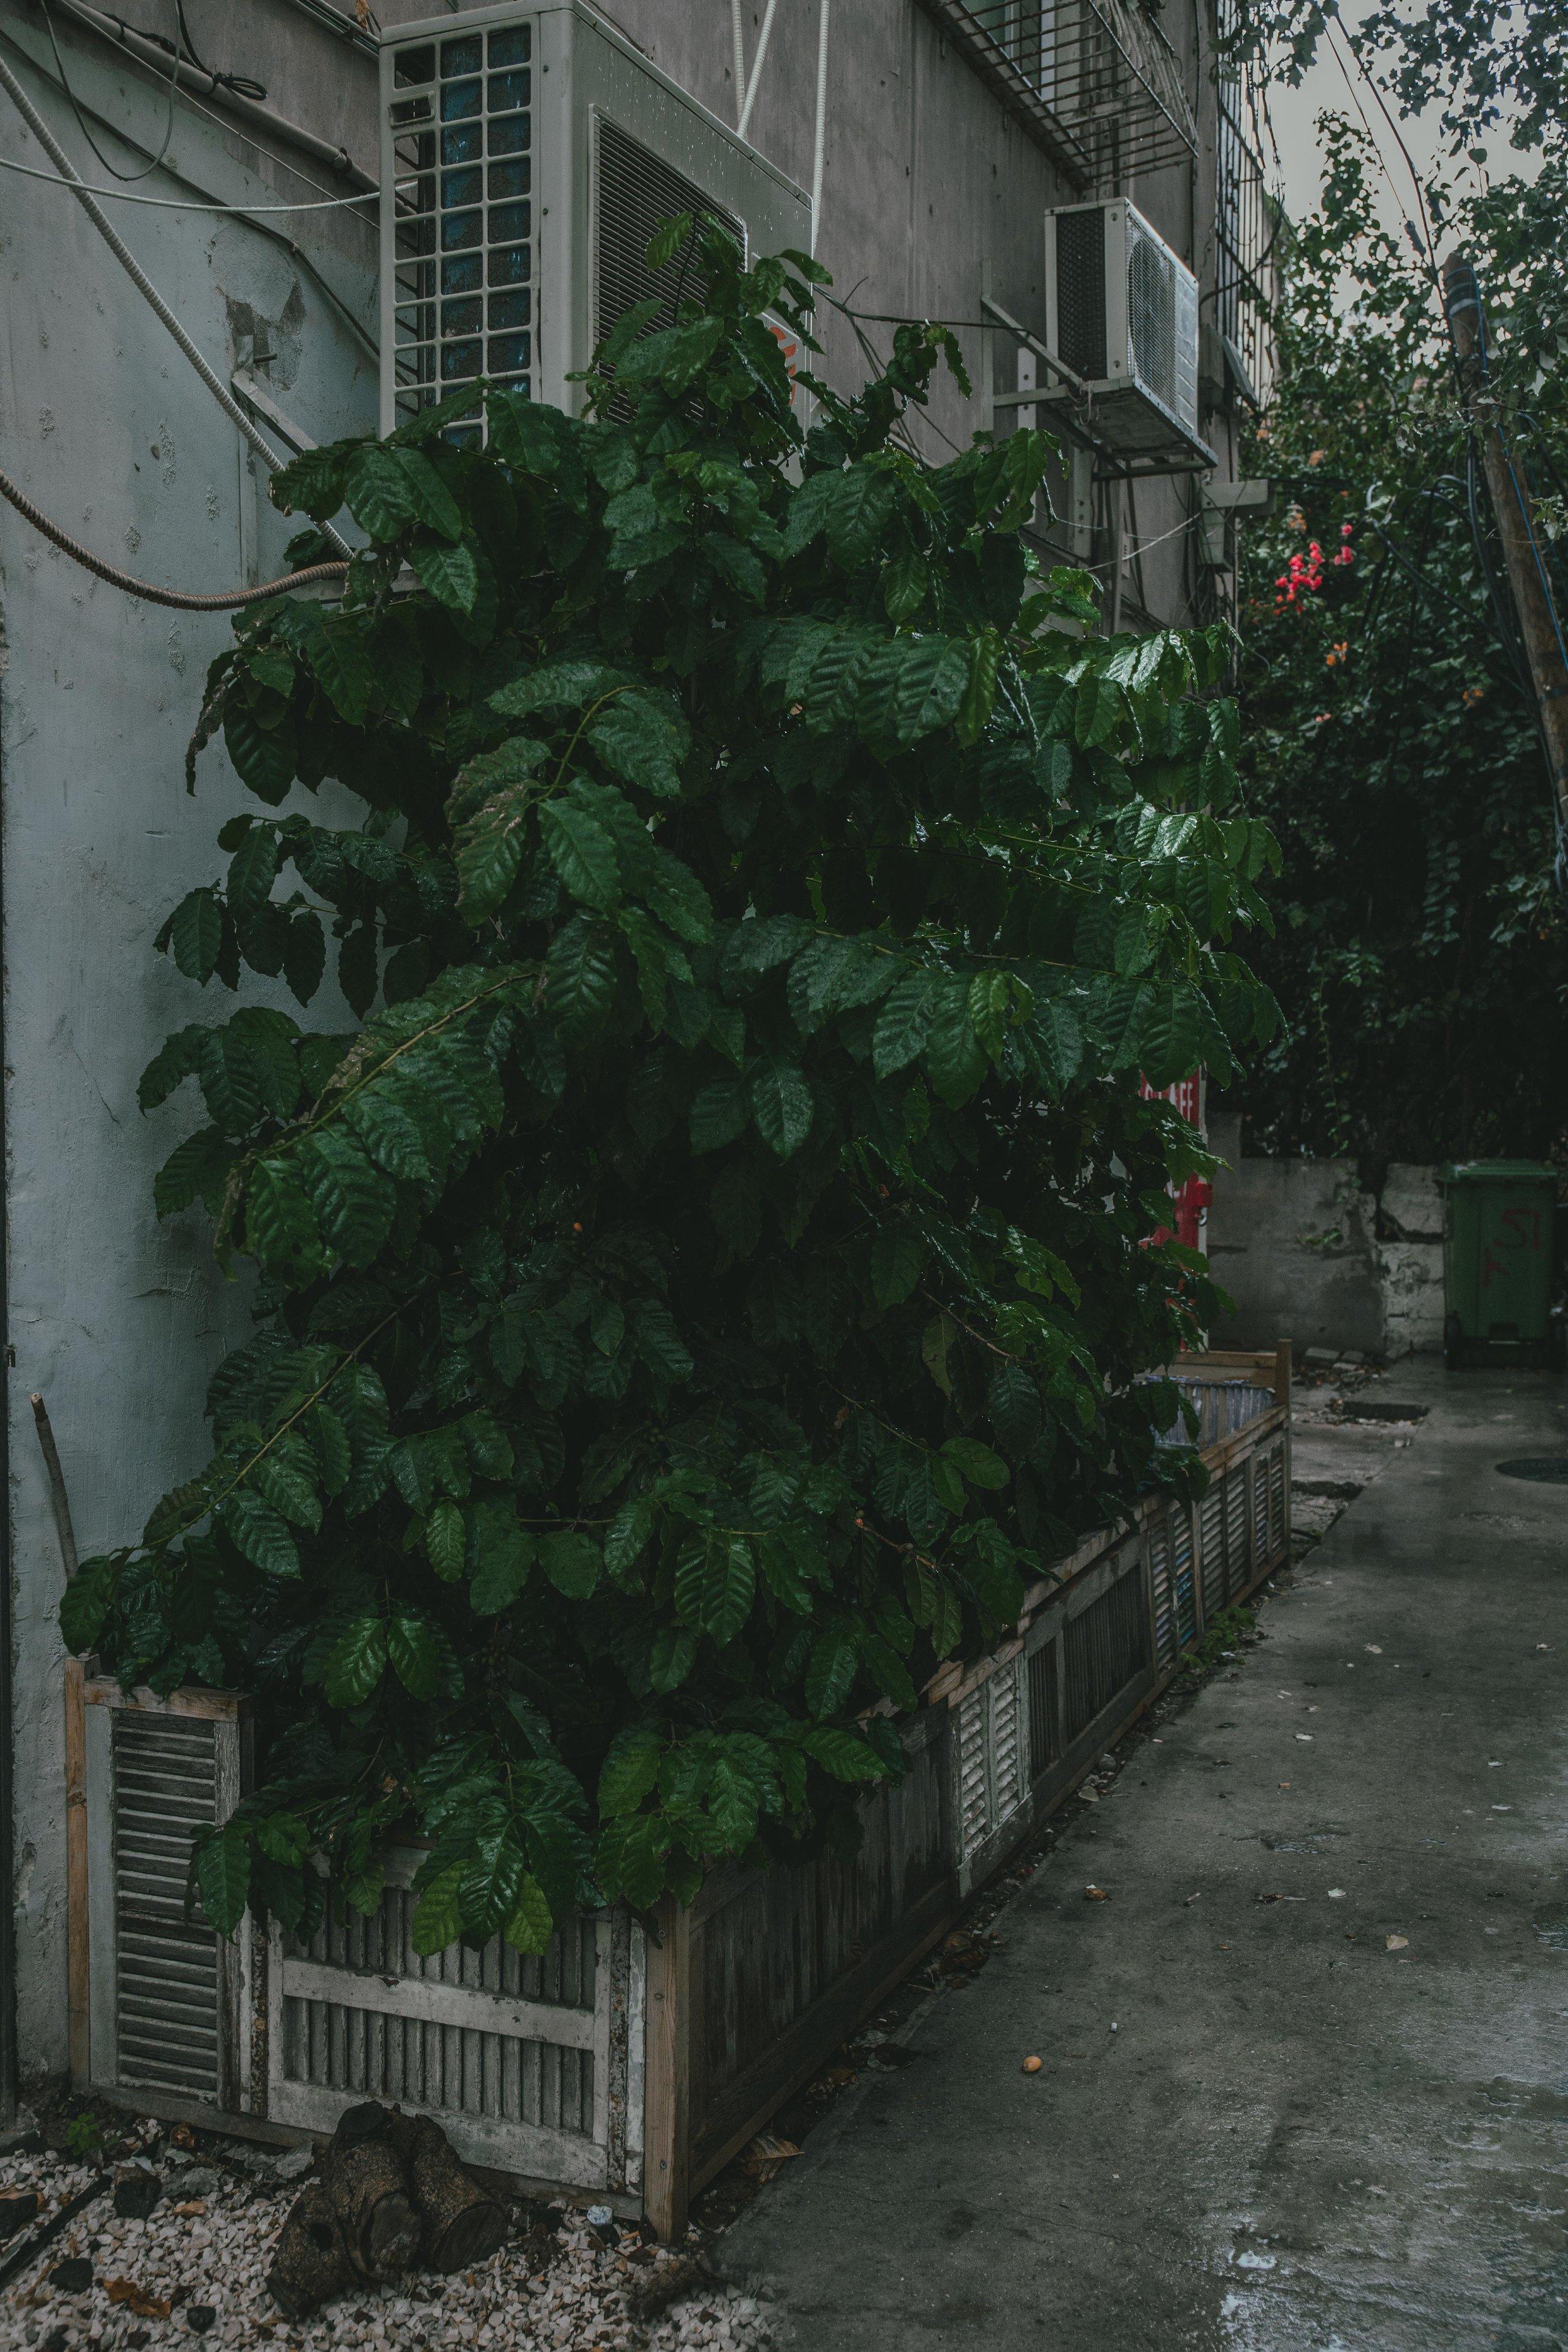 Arabica coffee tree growing in the garden